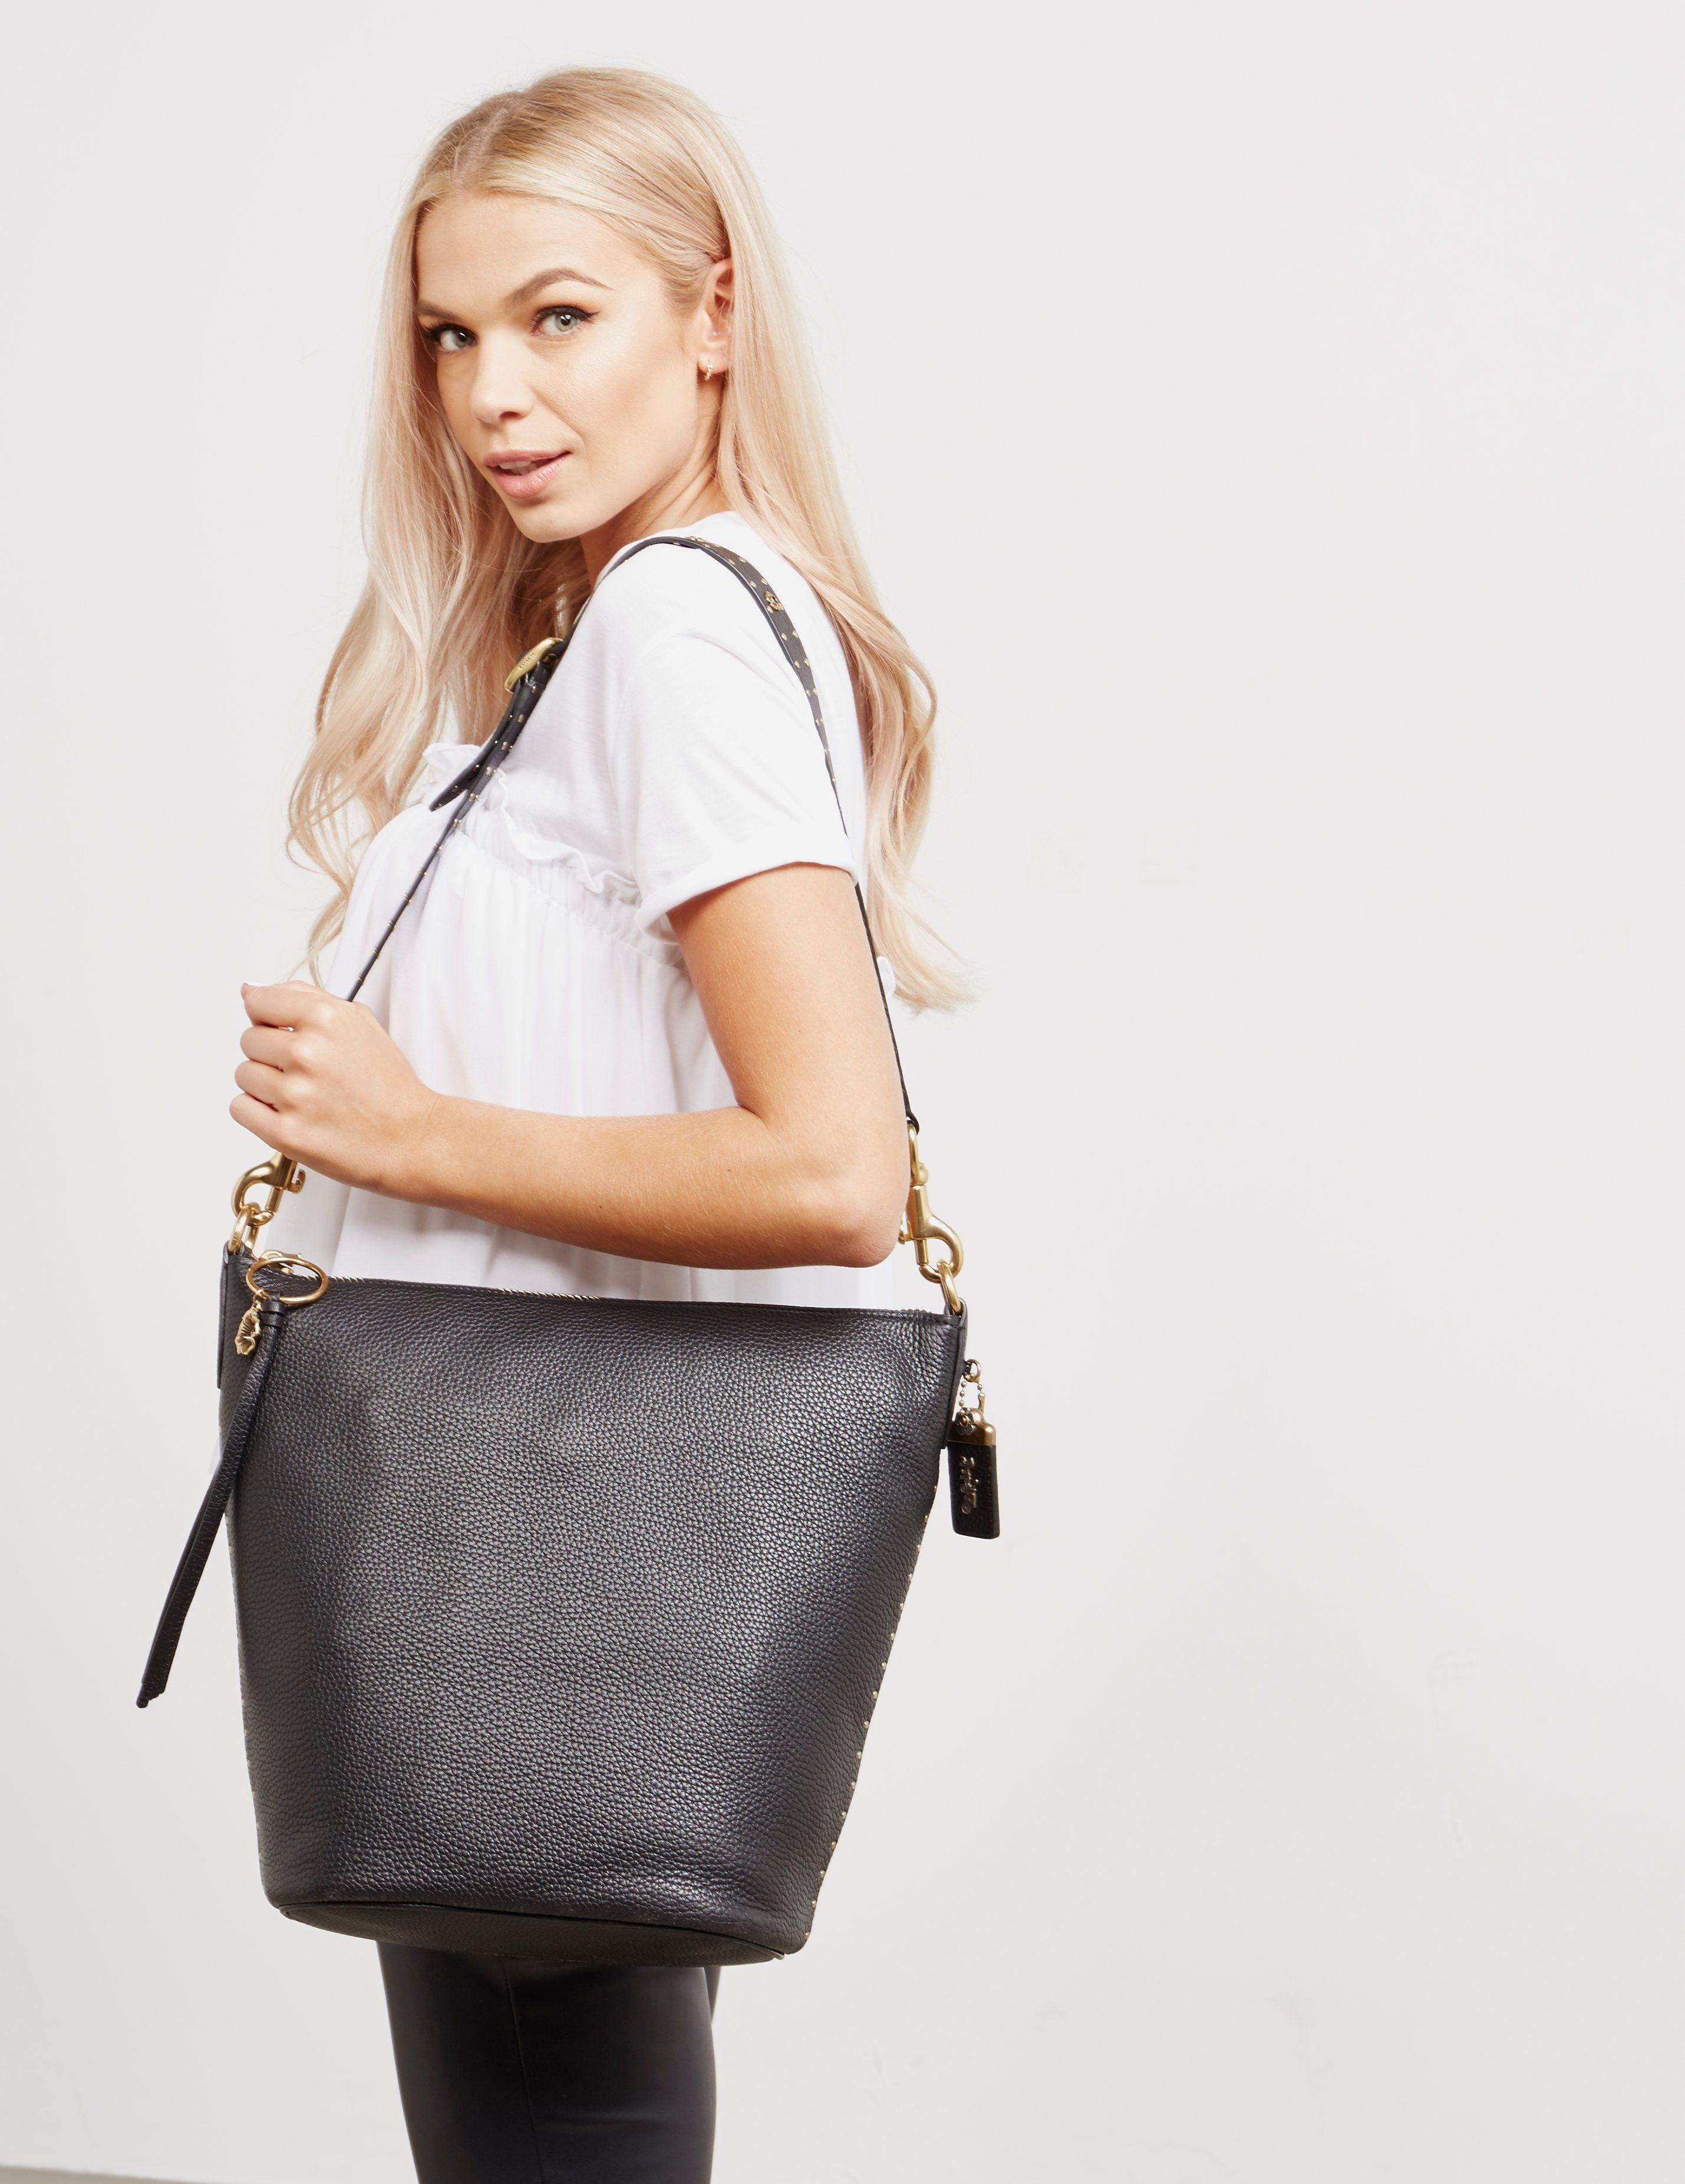 COACH Border Tote Bag - Online Exclusive